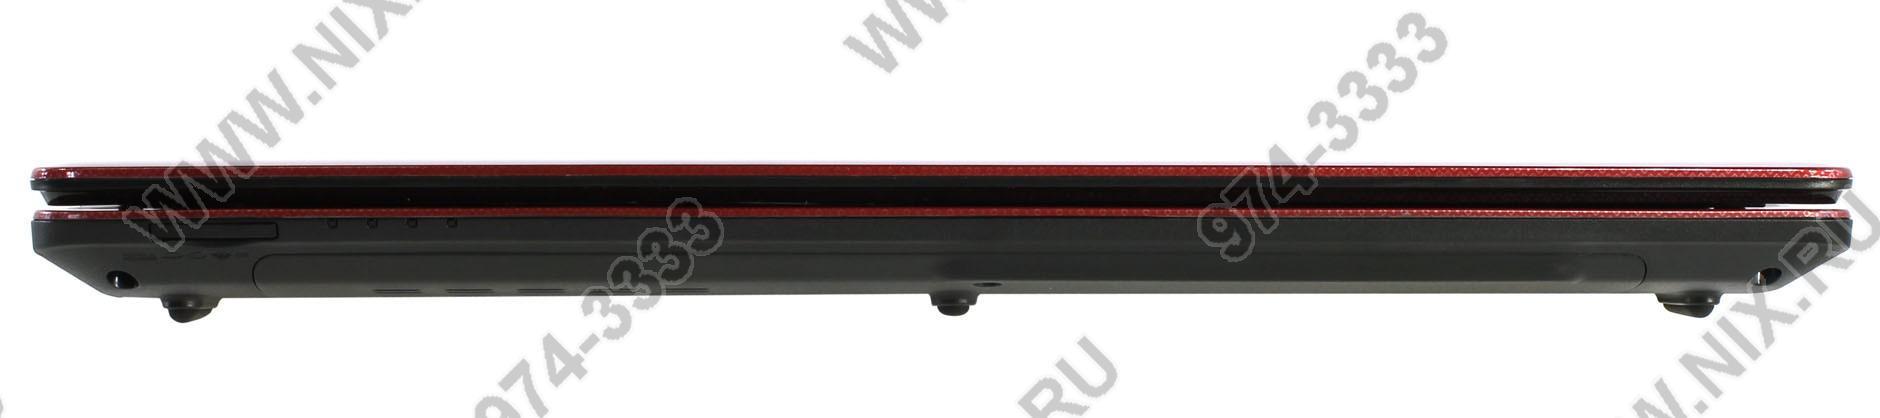 Packard bell easynote lm94, ростов, цена и фото, объявление 16009